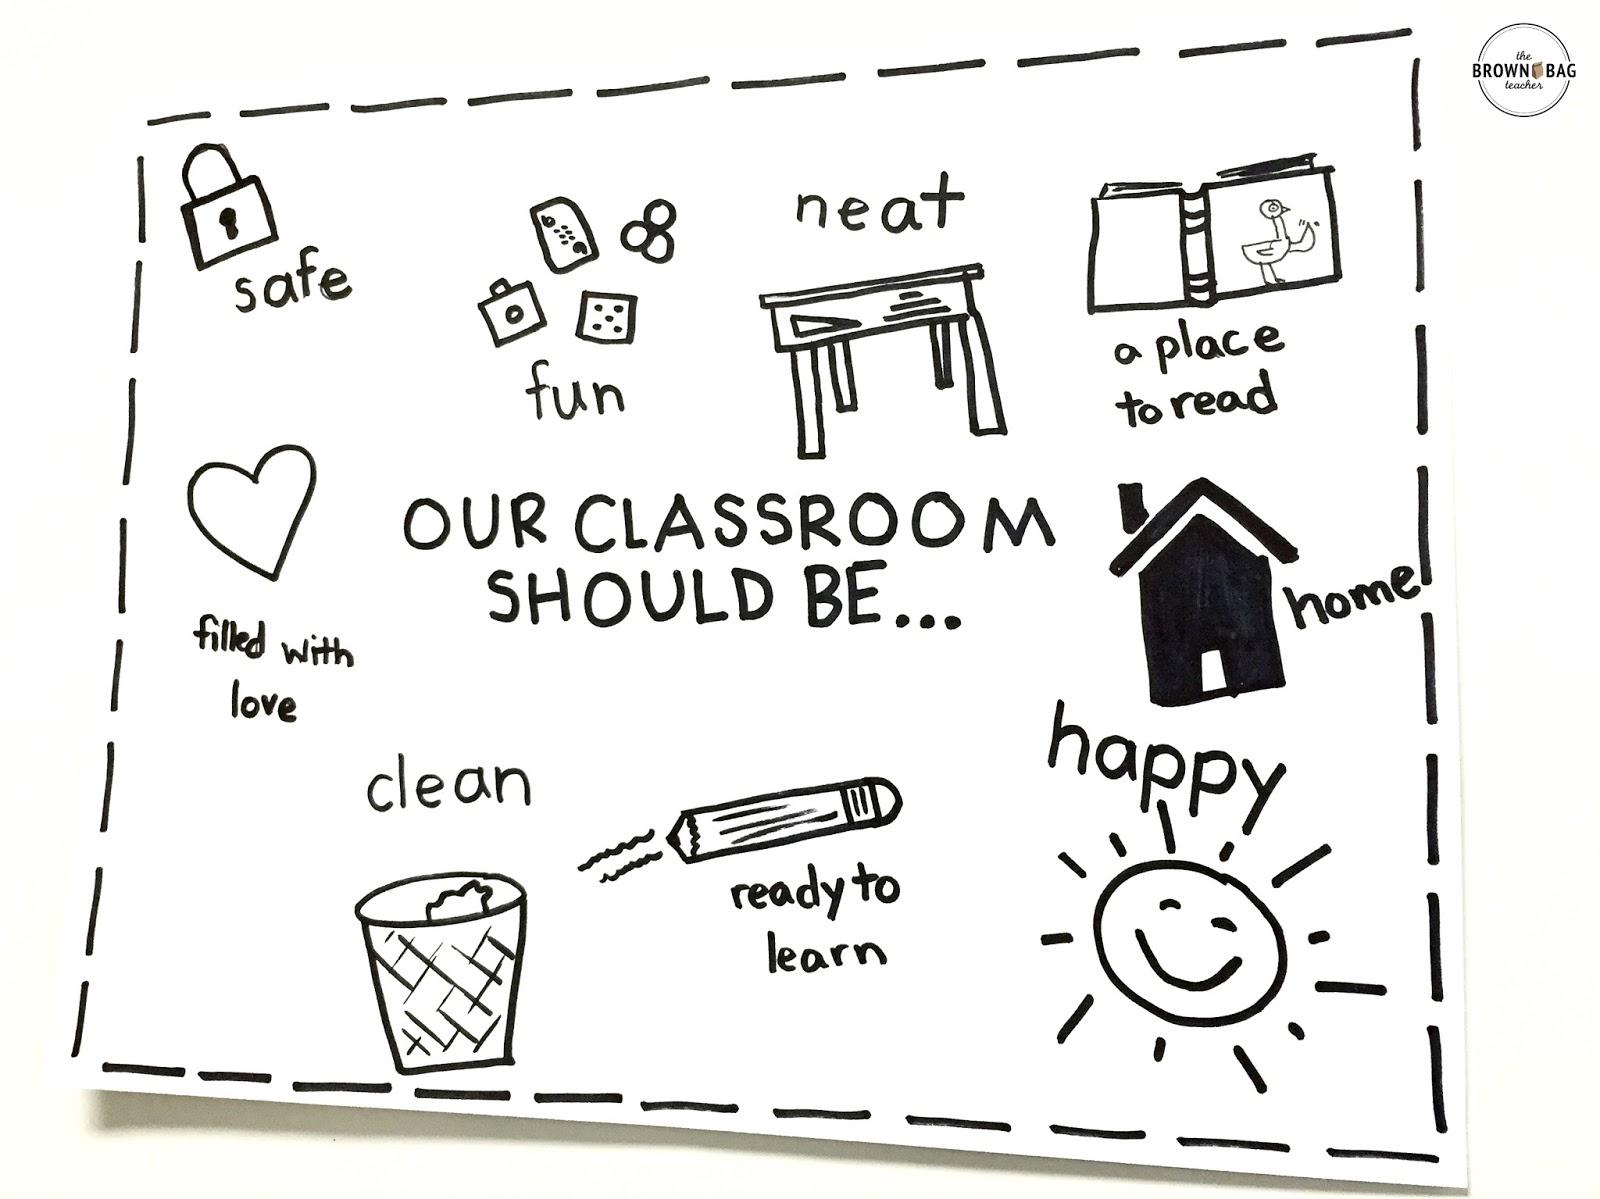 5 Tips For An Organized Classroom